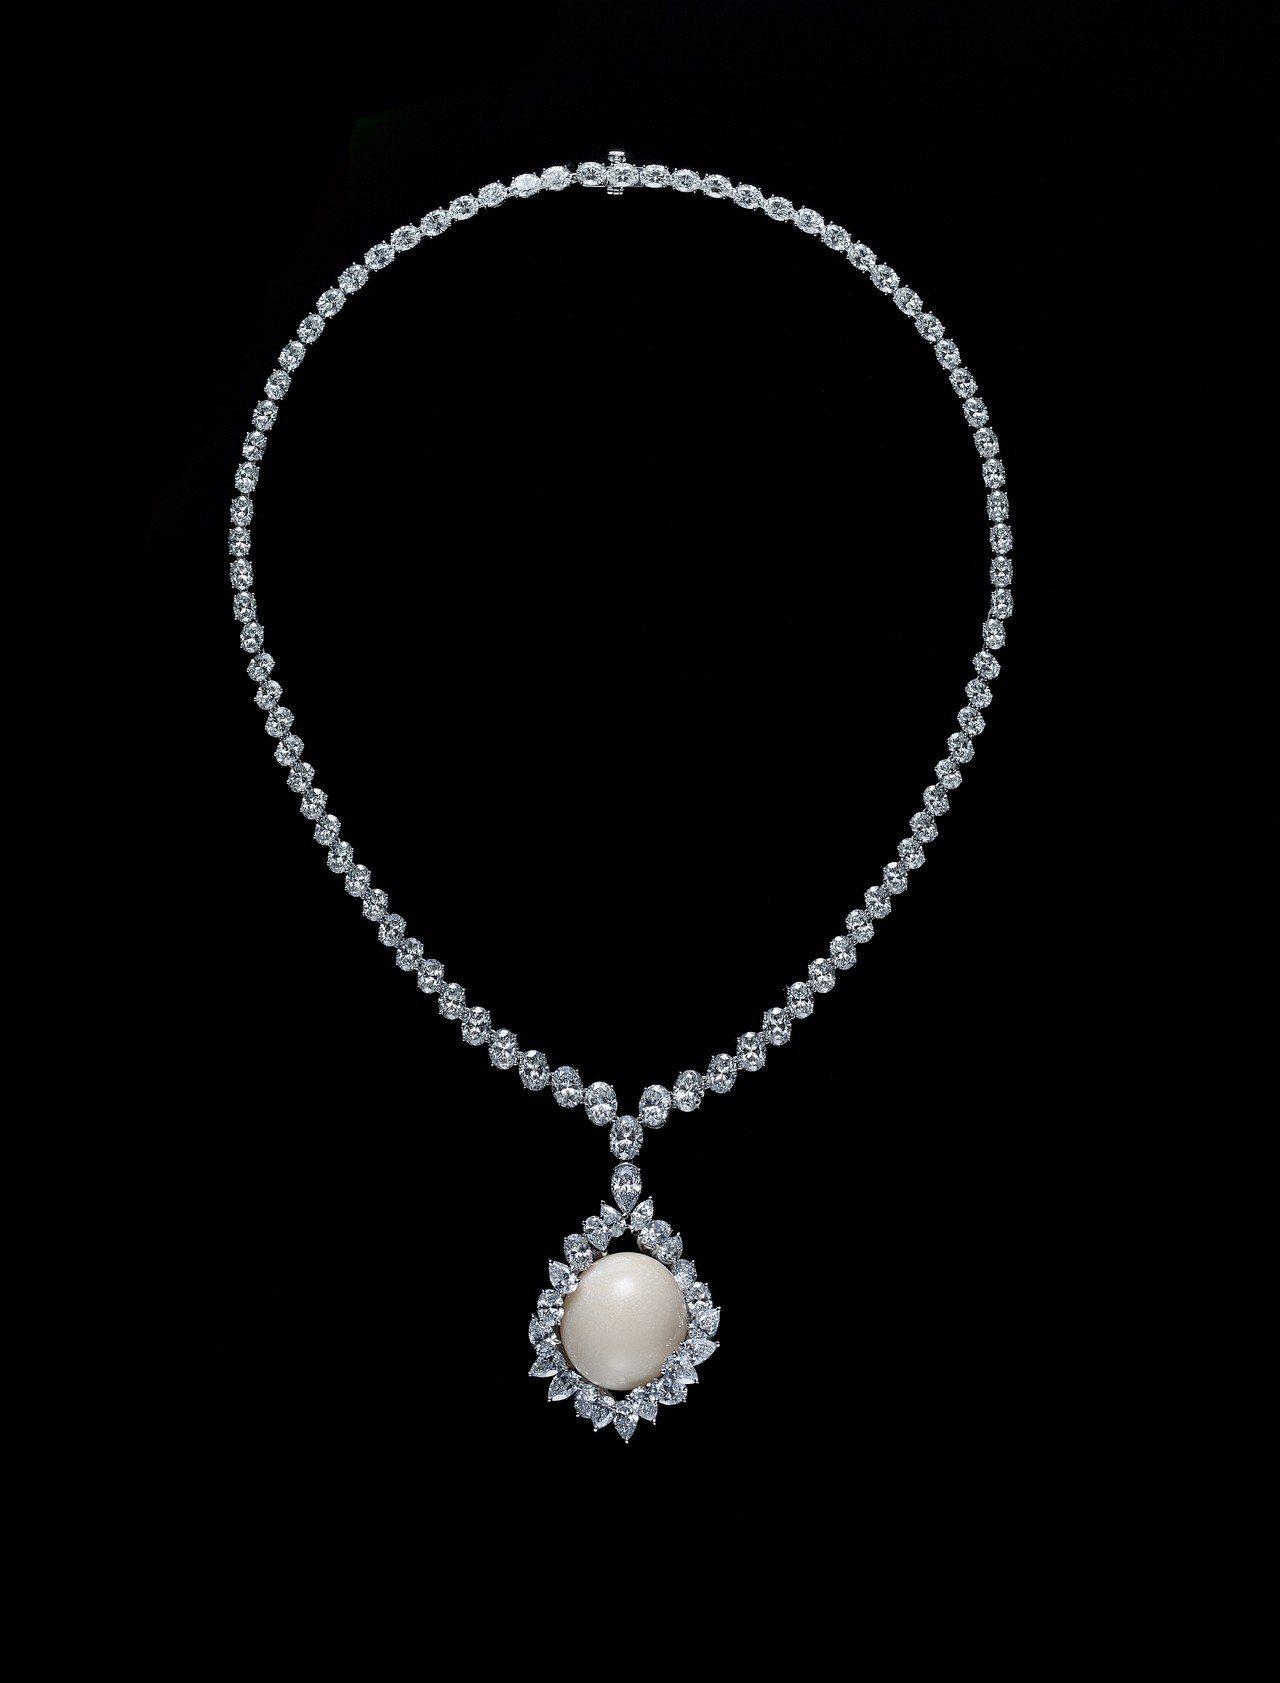 MIKIMOTO μ系列Horse Conch孔克珍珠頂級珠寶鑽石墜鍊,3,10...